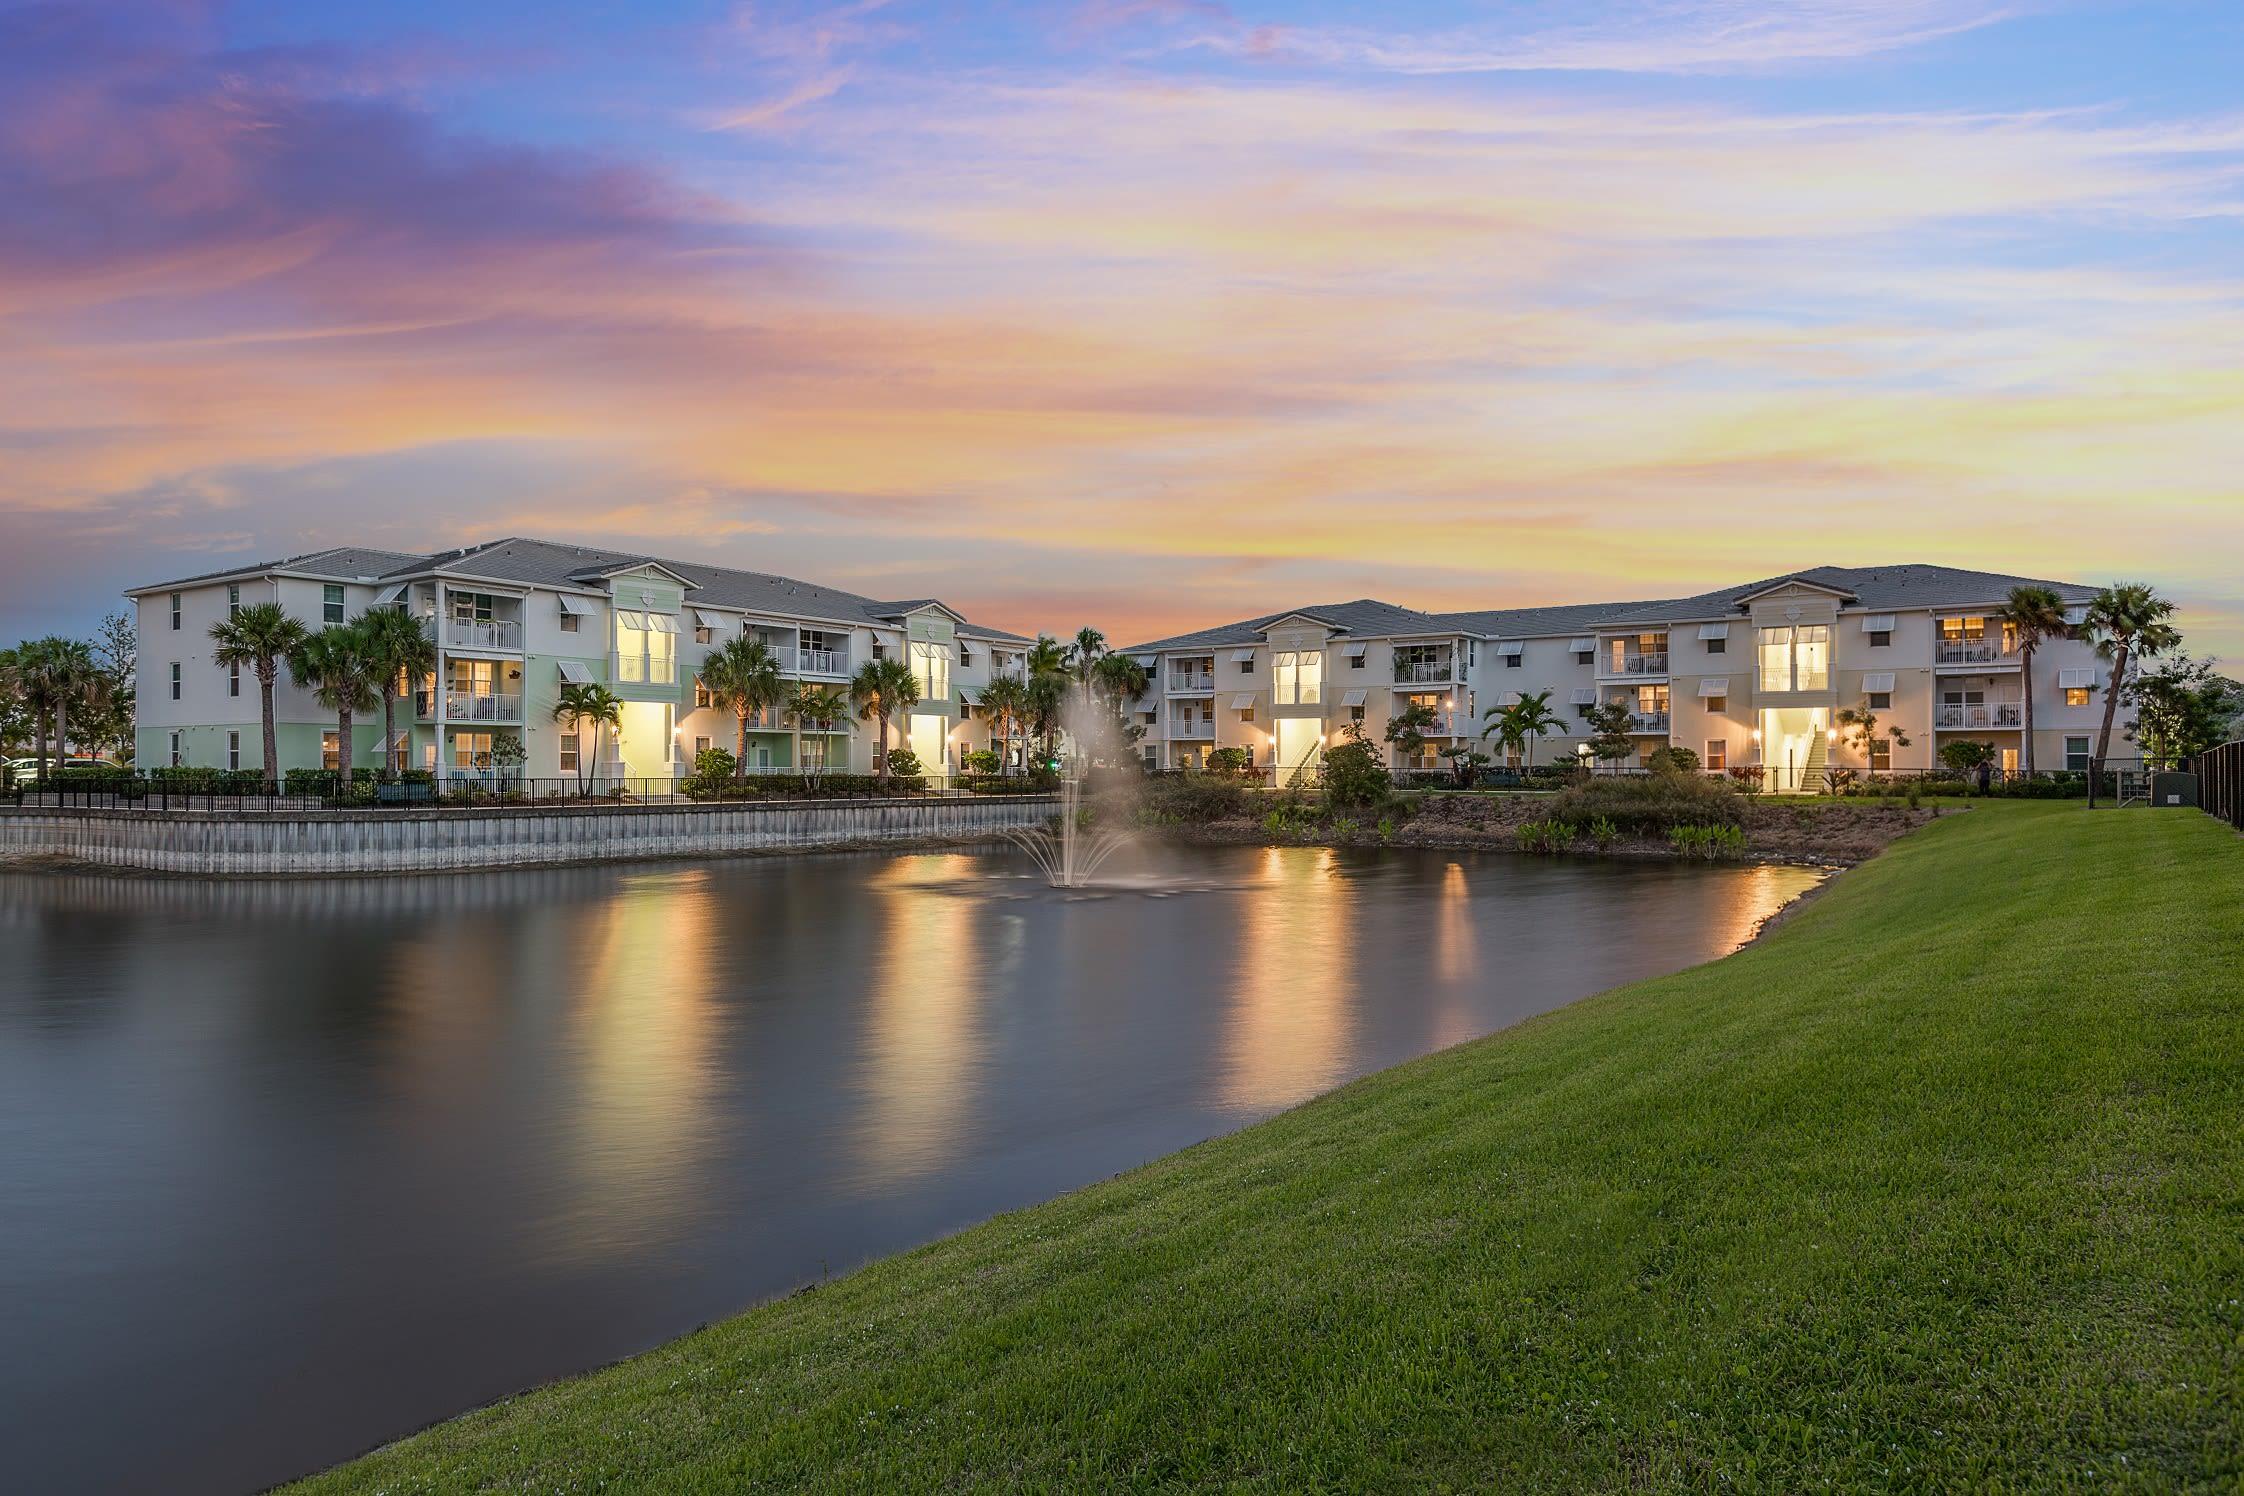 Exterior view of our apartments at High Ridge Landing in Boynton Beach, Florida